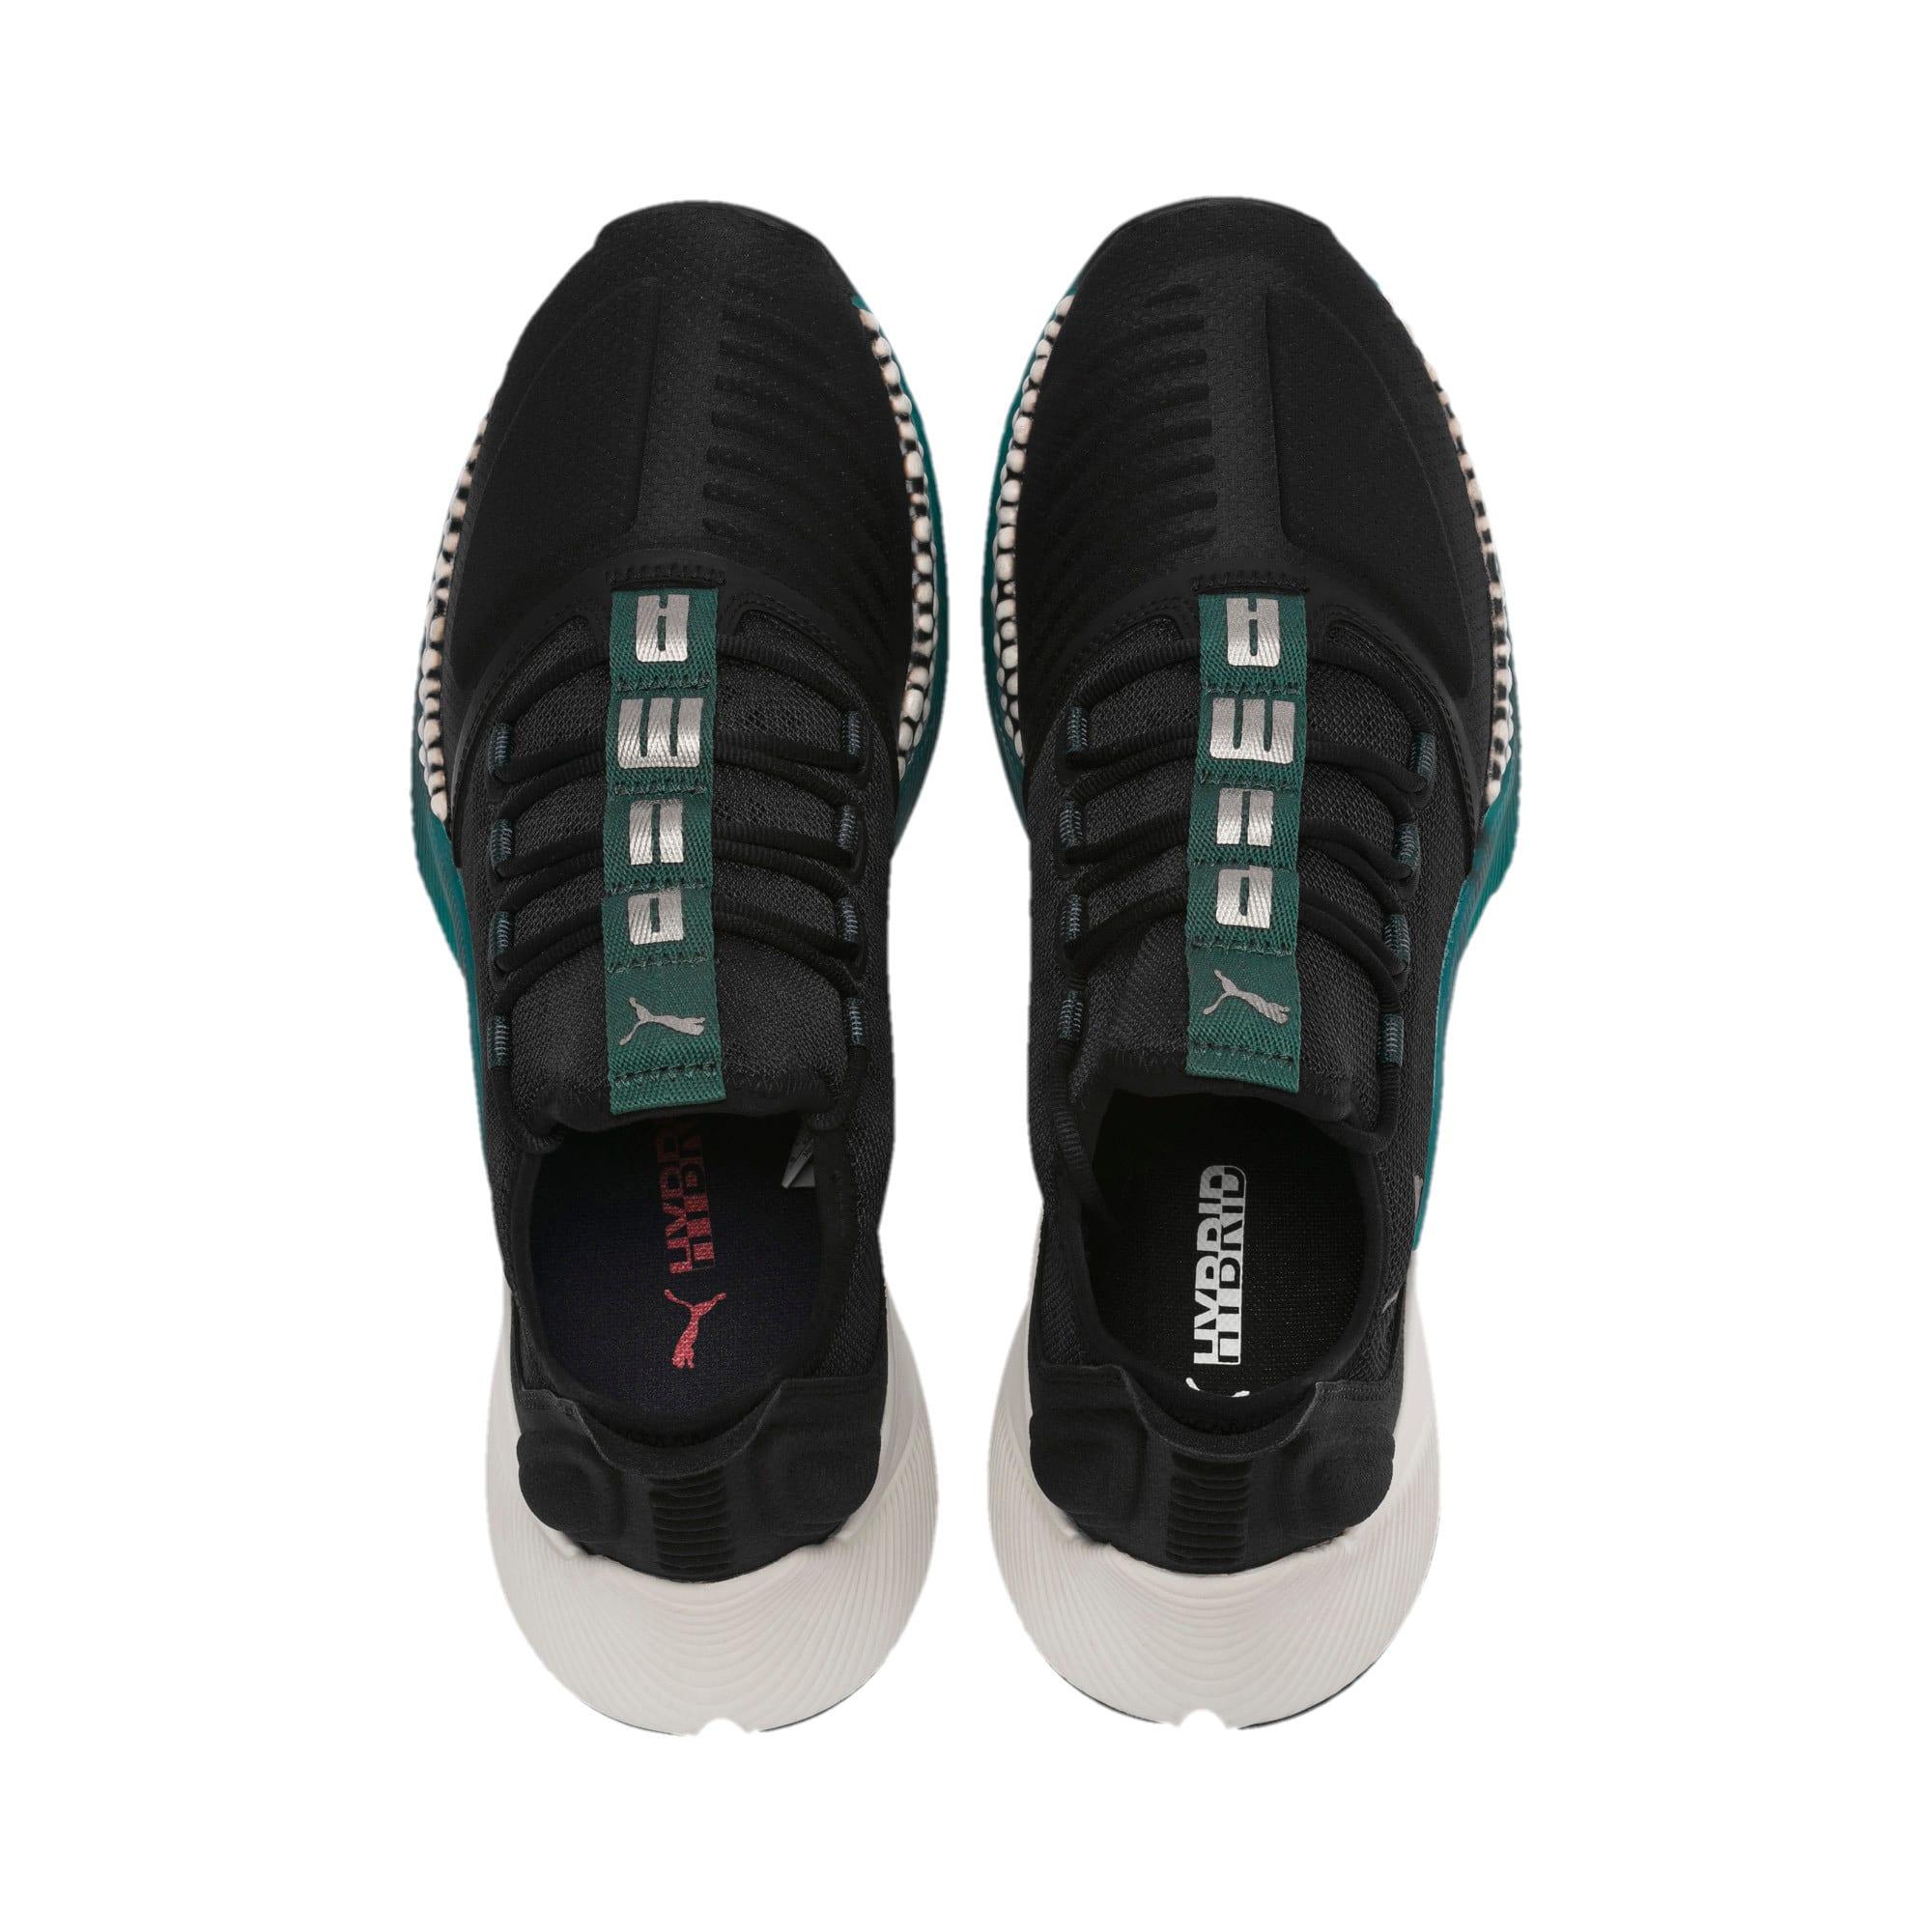 Thumbnail 7 of Xcelerator Men's Sneakers, Black-Glacier Gray-Ponderosa, medium